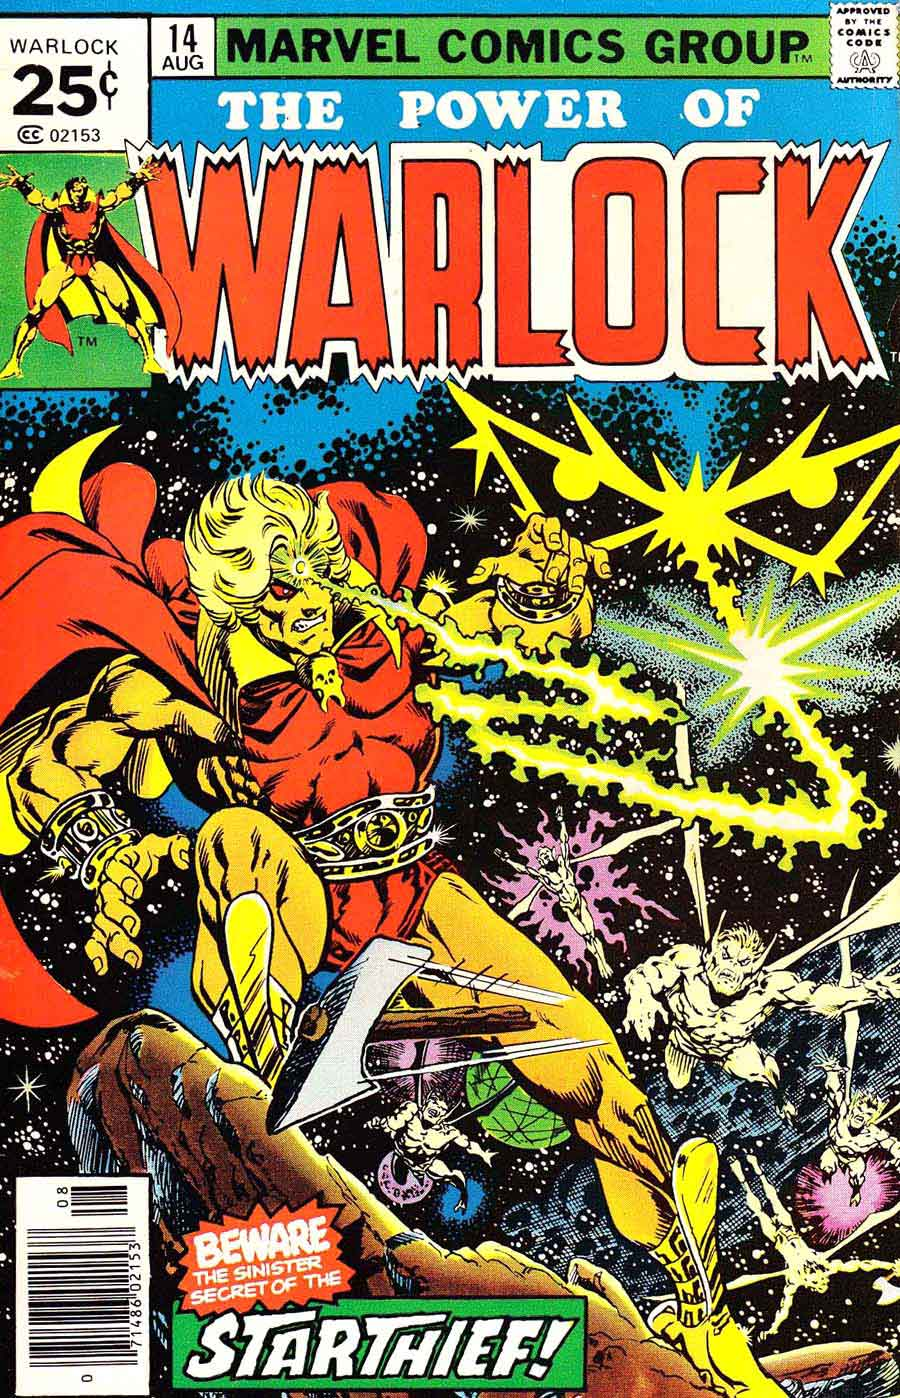 Warlock v1 #14 marvel 1970s bronze age comic book cover art by Jim Starlin